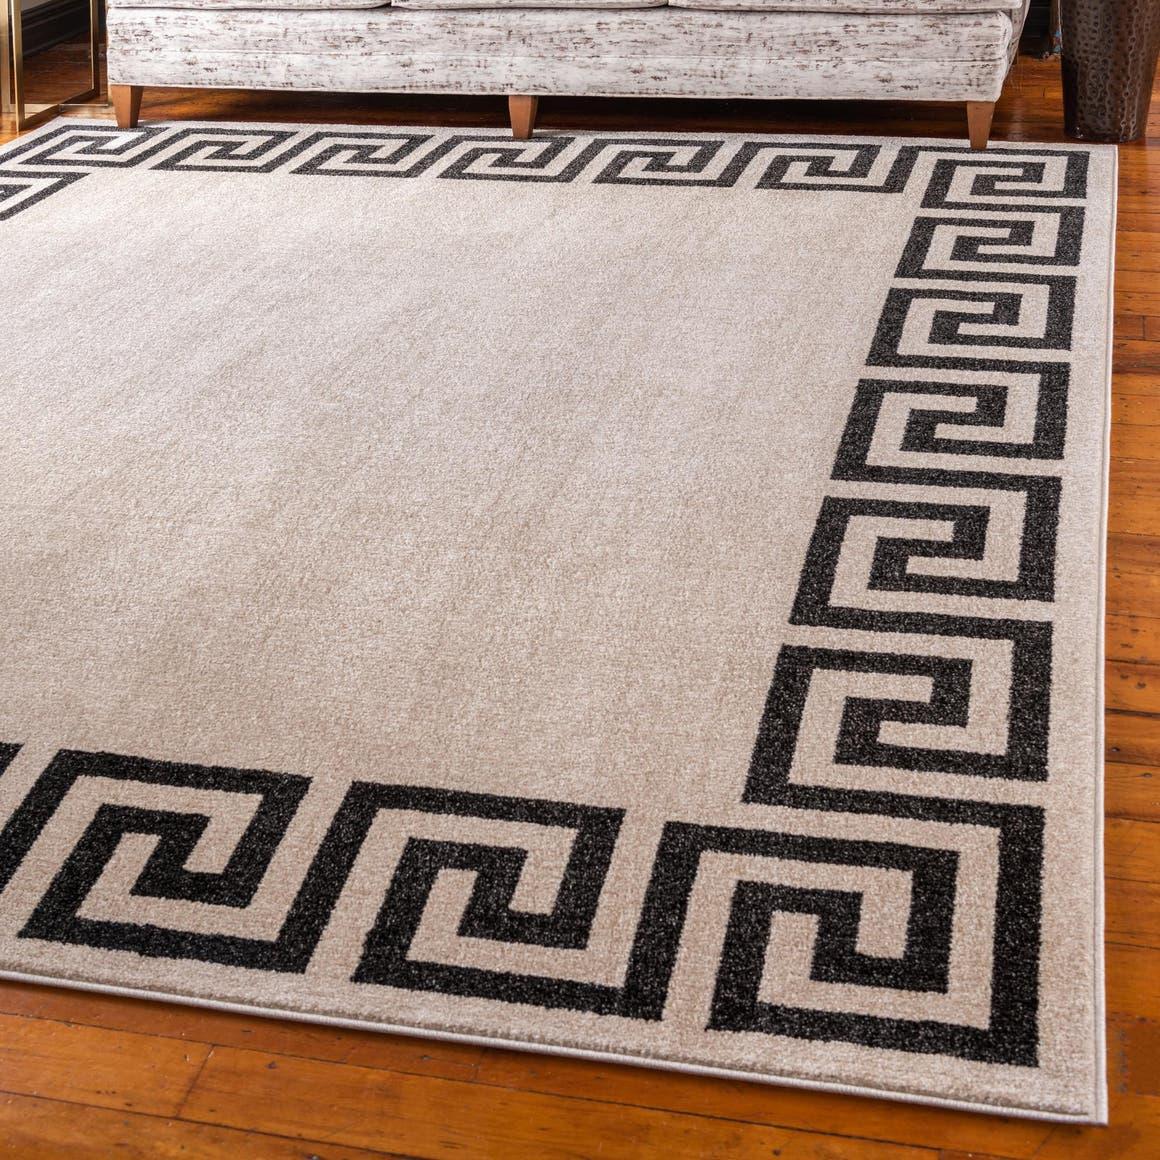 8' x 8' Greek Key Square Rug main image